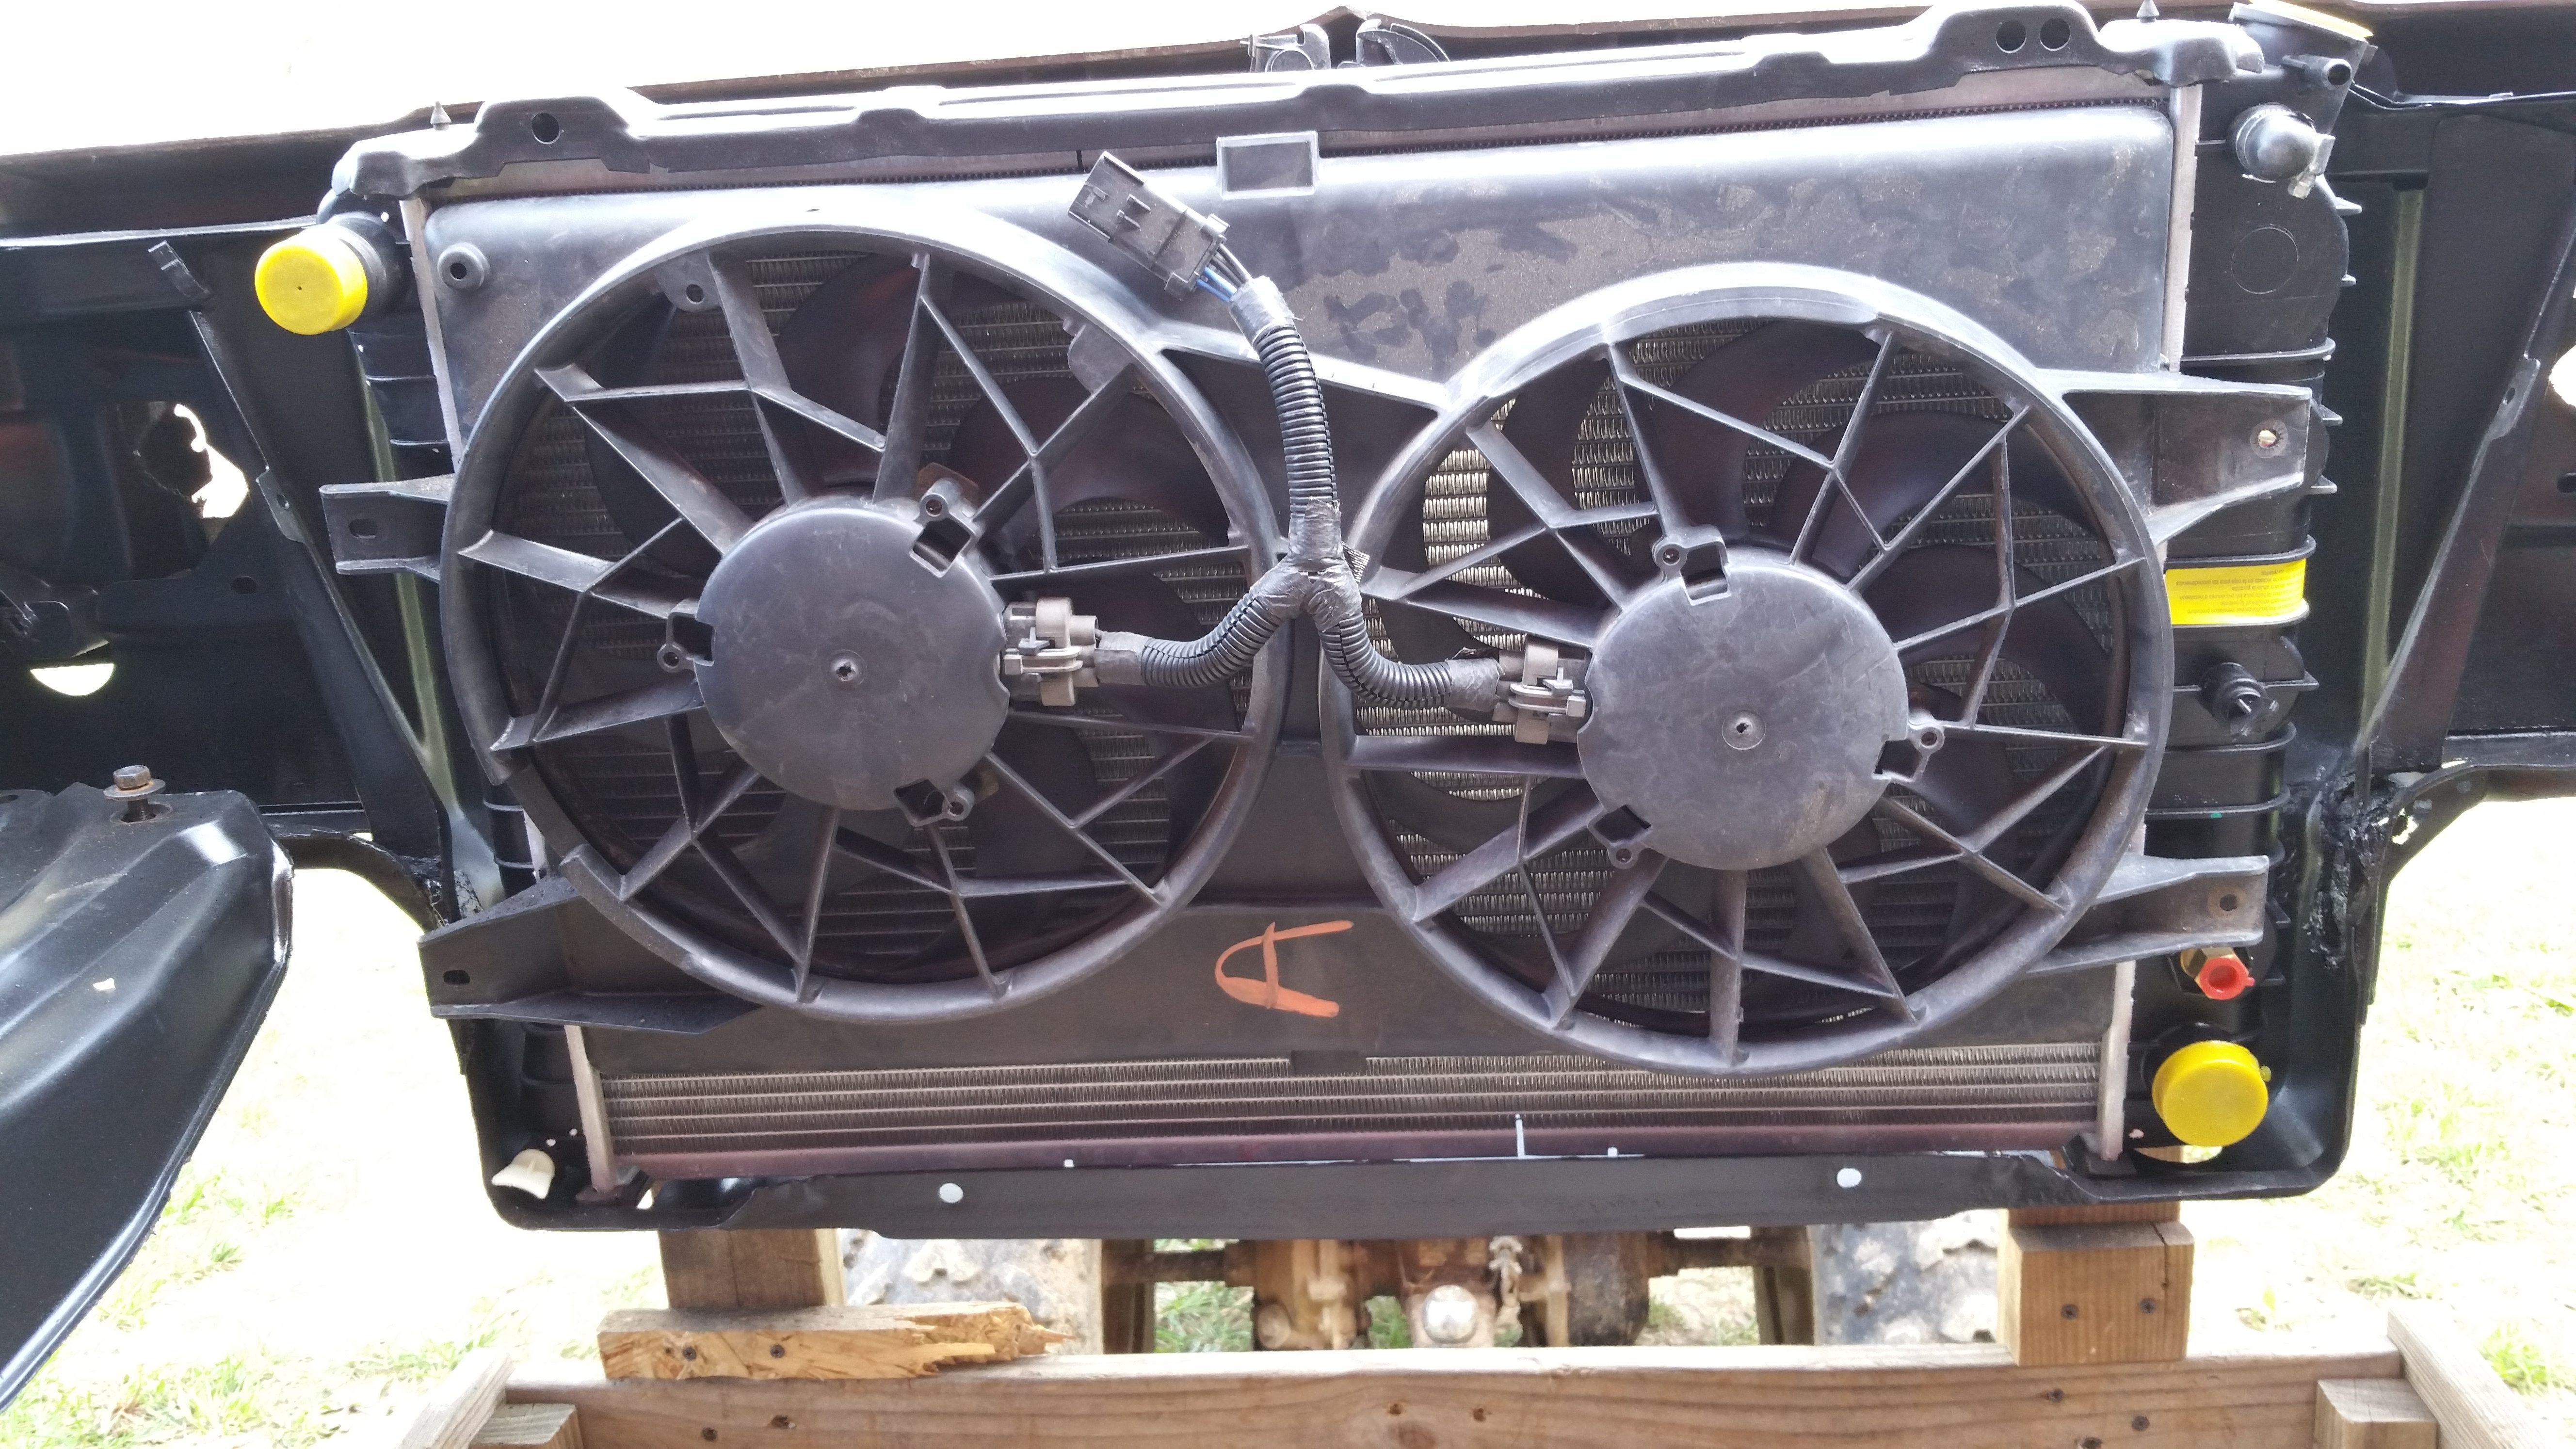 [SCHEMATICS_4HG]  Electric Cooling Fan   1979 Malibu Wagon   Dodge Intrepid Wiring Diagram For Cooling Fans      1979 Malibu Wagon